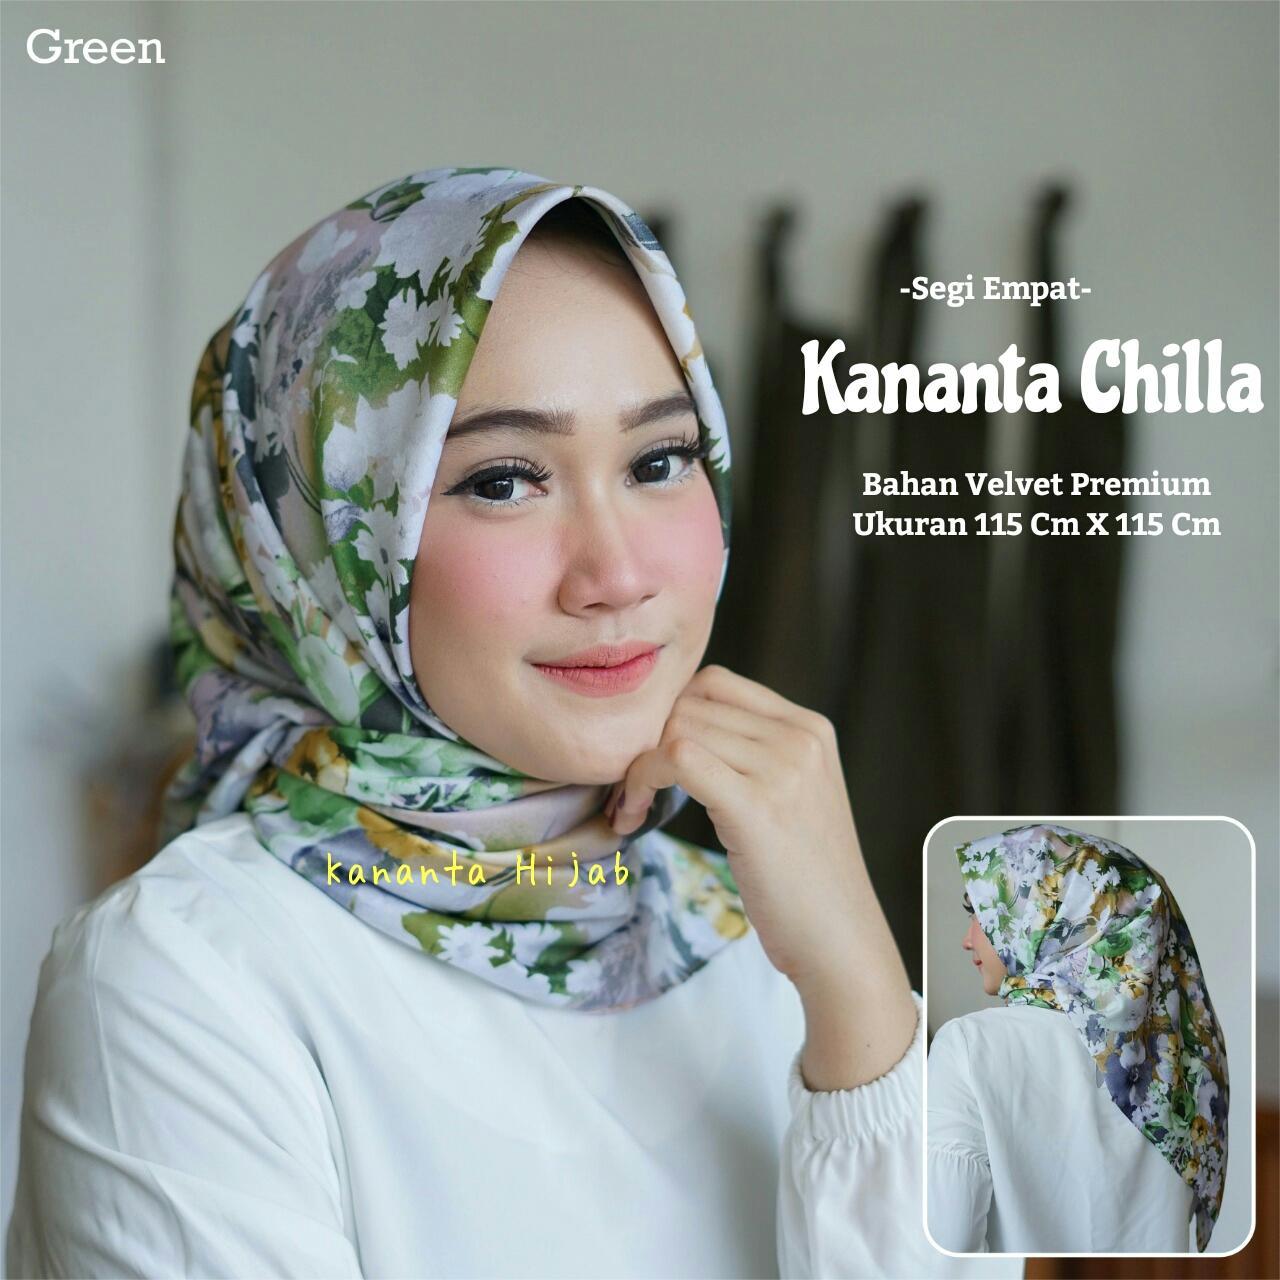 Jual Hijab Segi Murah Garansi Dan Berkualitas Id Store New Voal Segiempat Exlusive Print Maxmara Limited Rp 62900